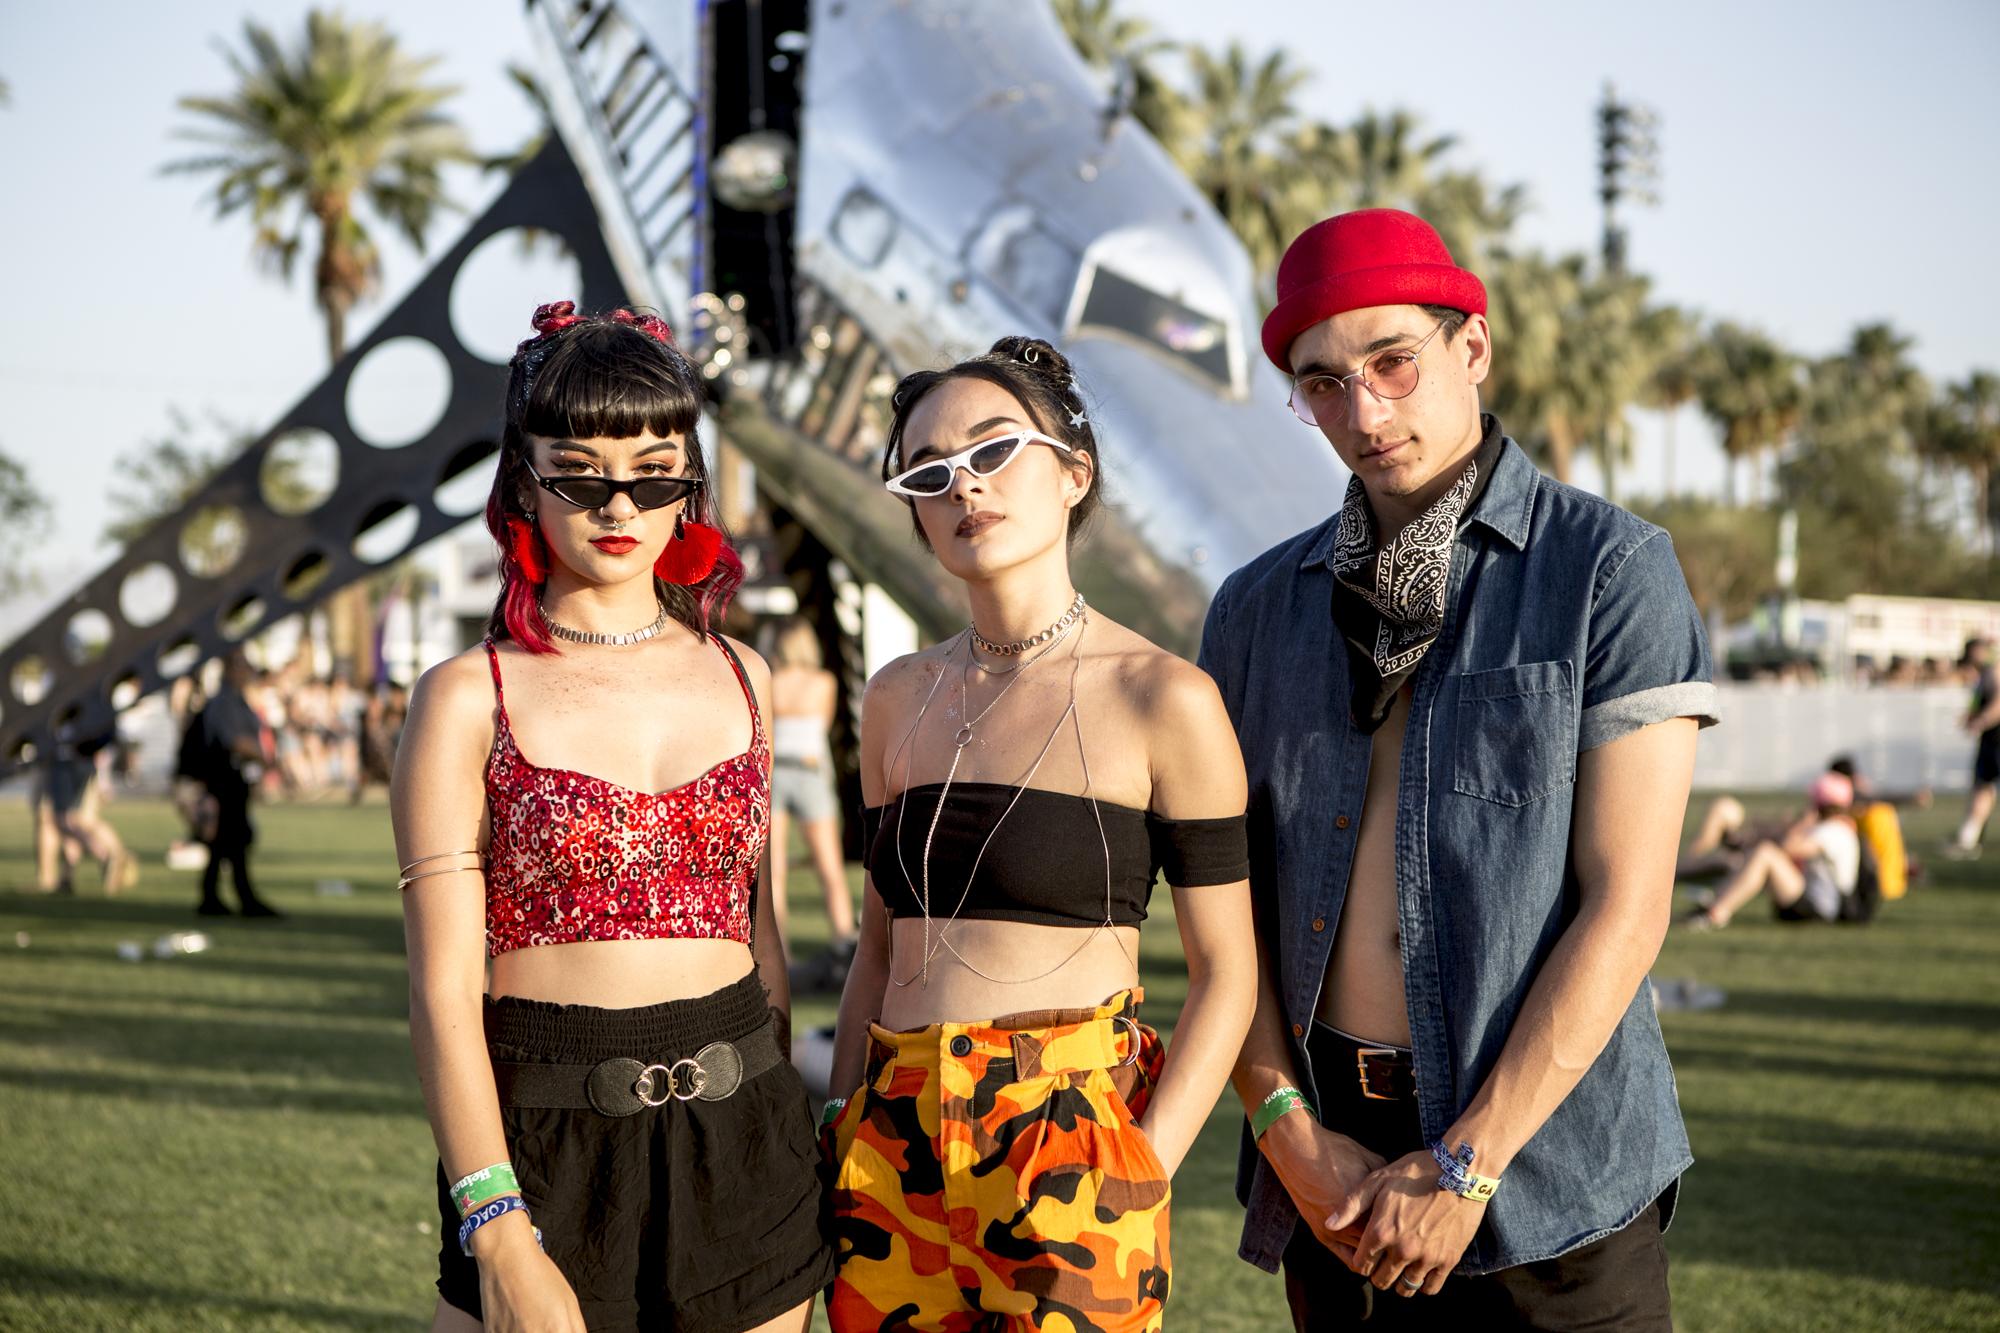 Coachella 2018 Festival Fashion: Best Dressed Gallery